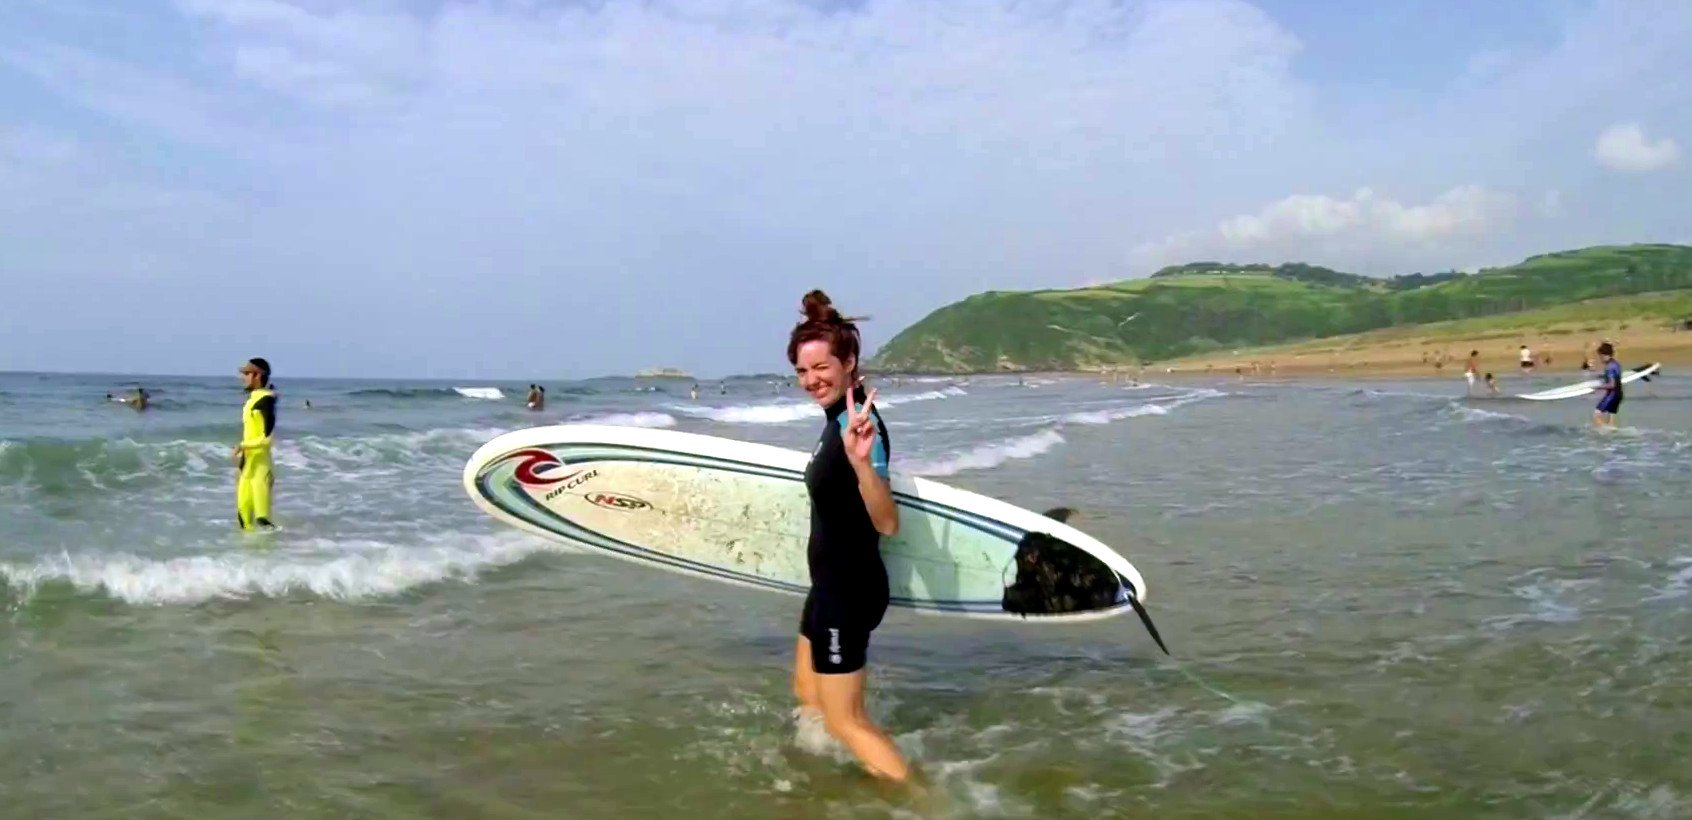 Surf de campusbilbao en Zarautz